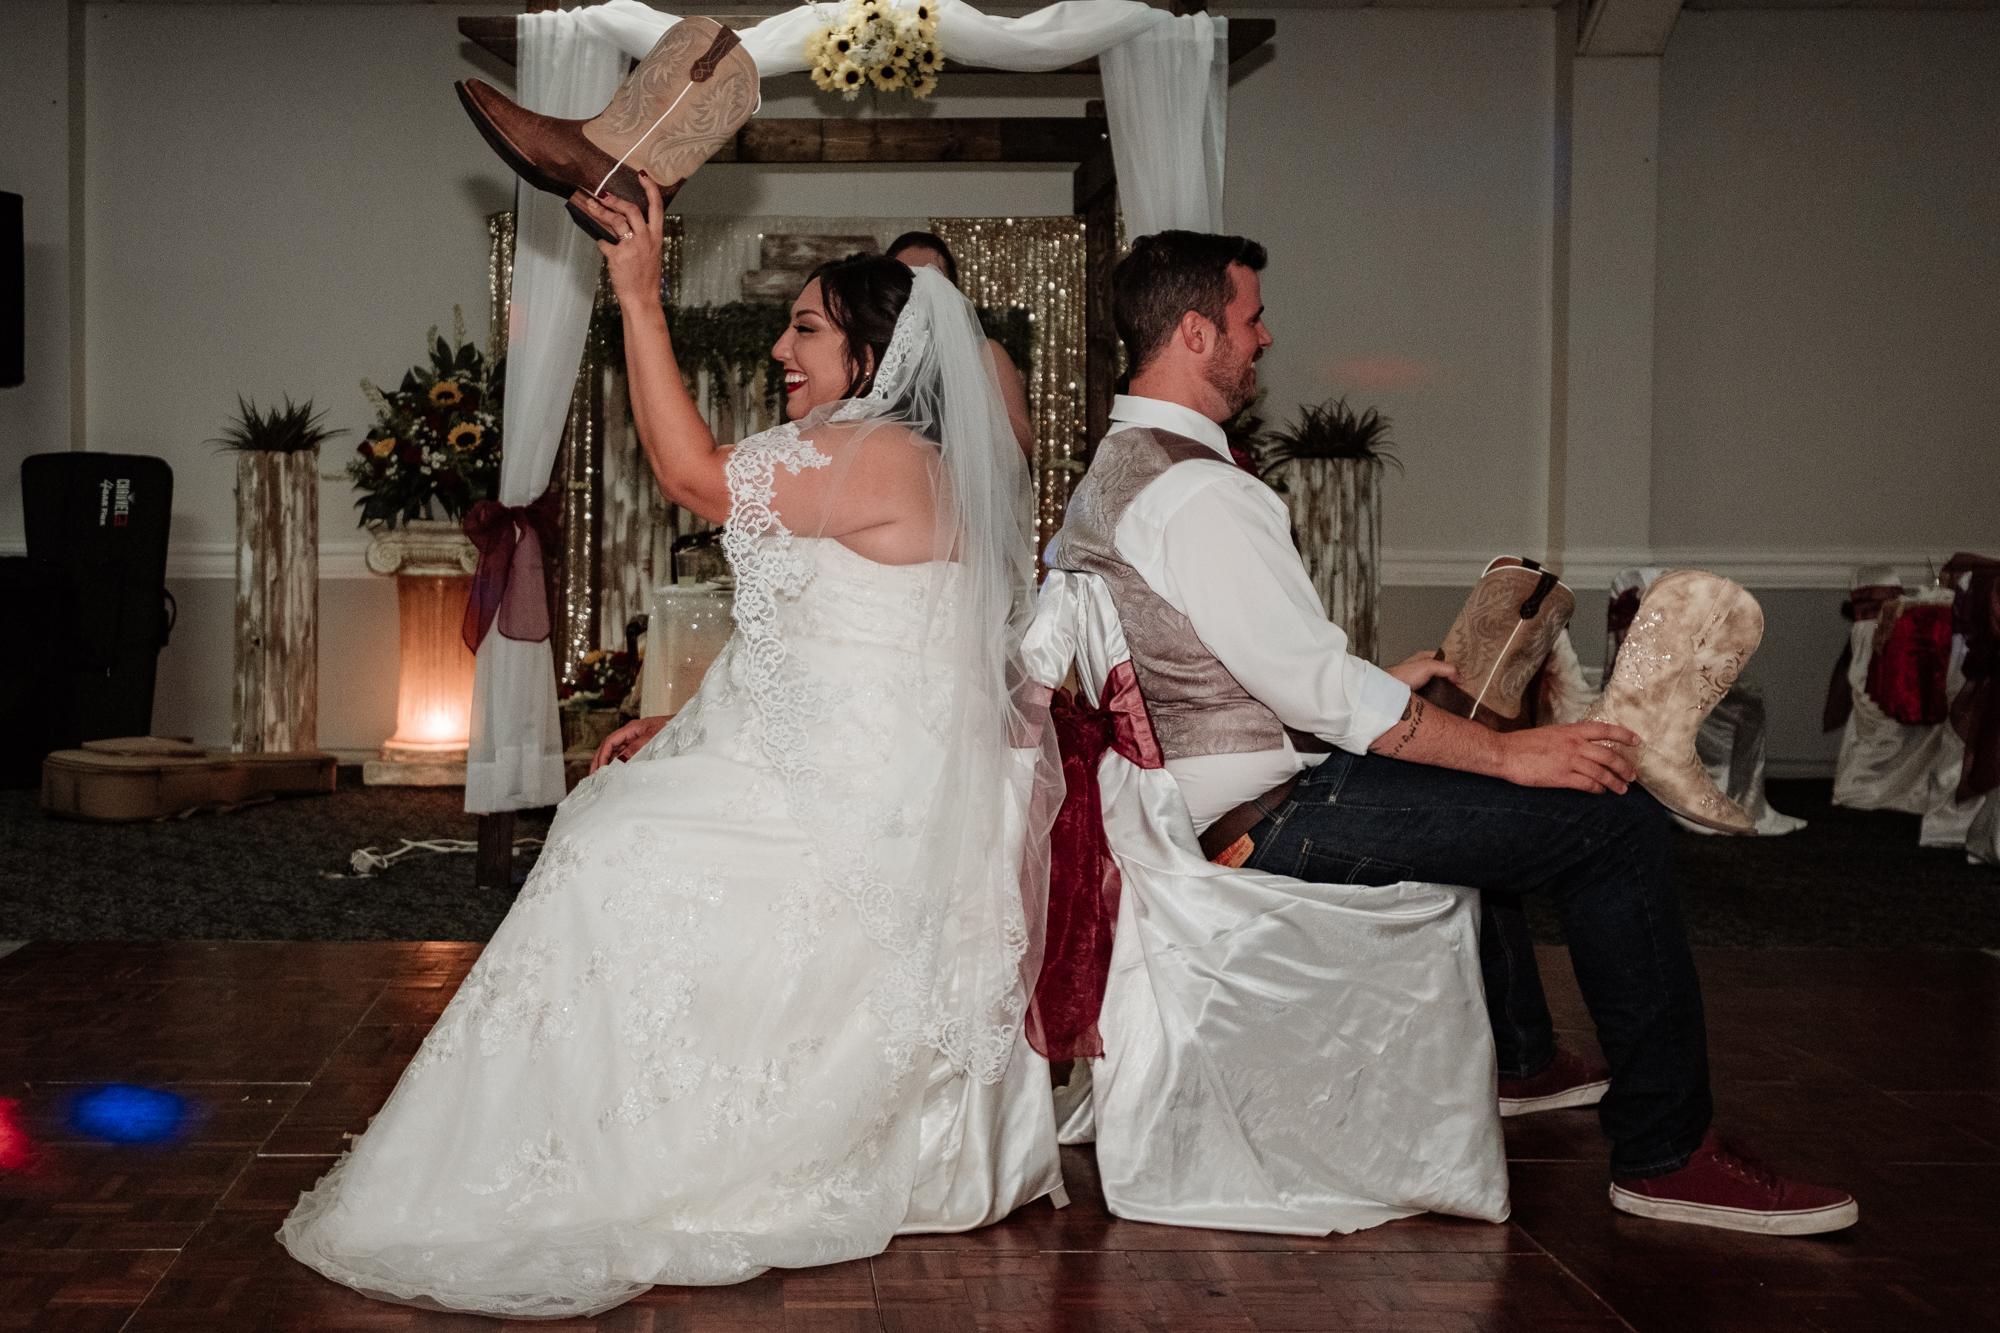 DallasAlyssa-Wedding-2019-JF-1927.jpg